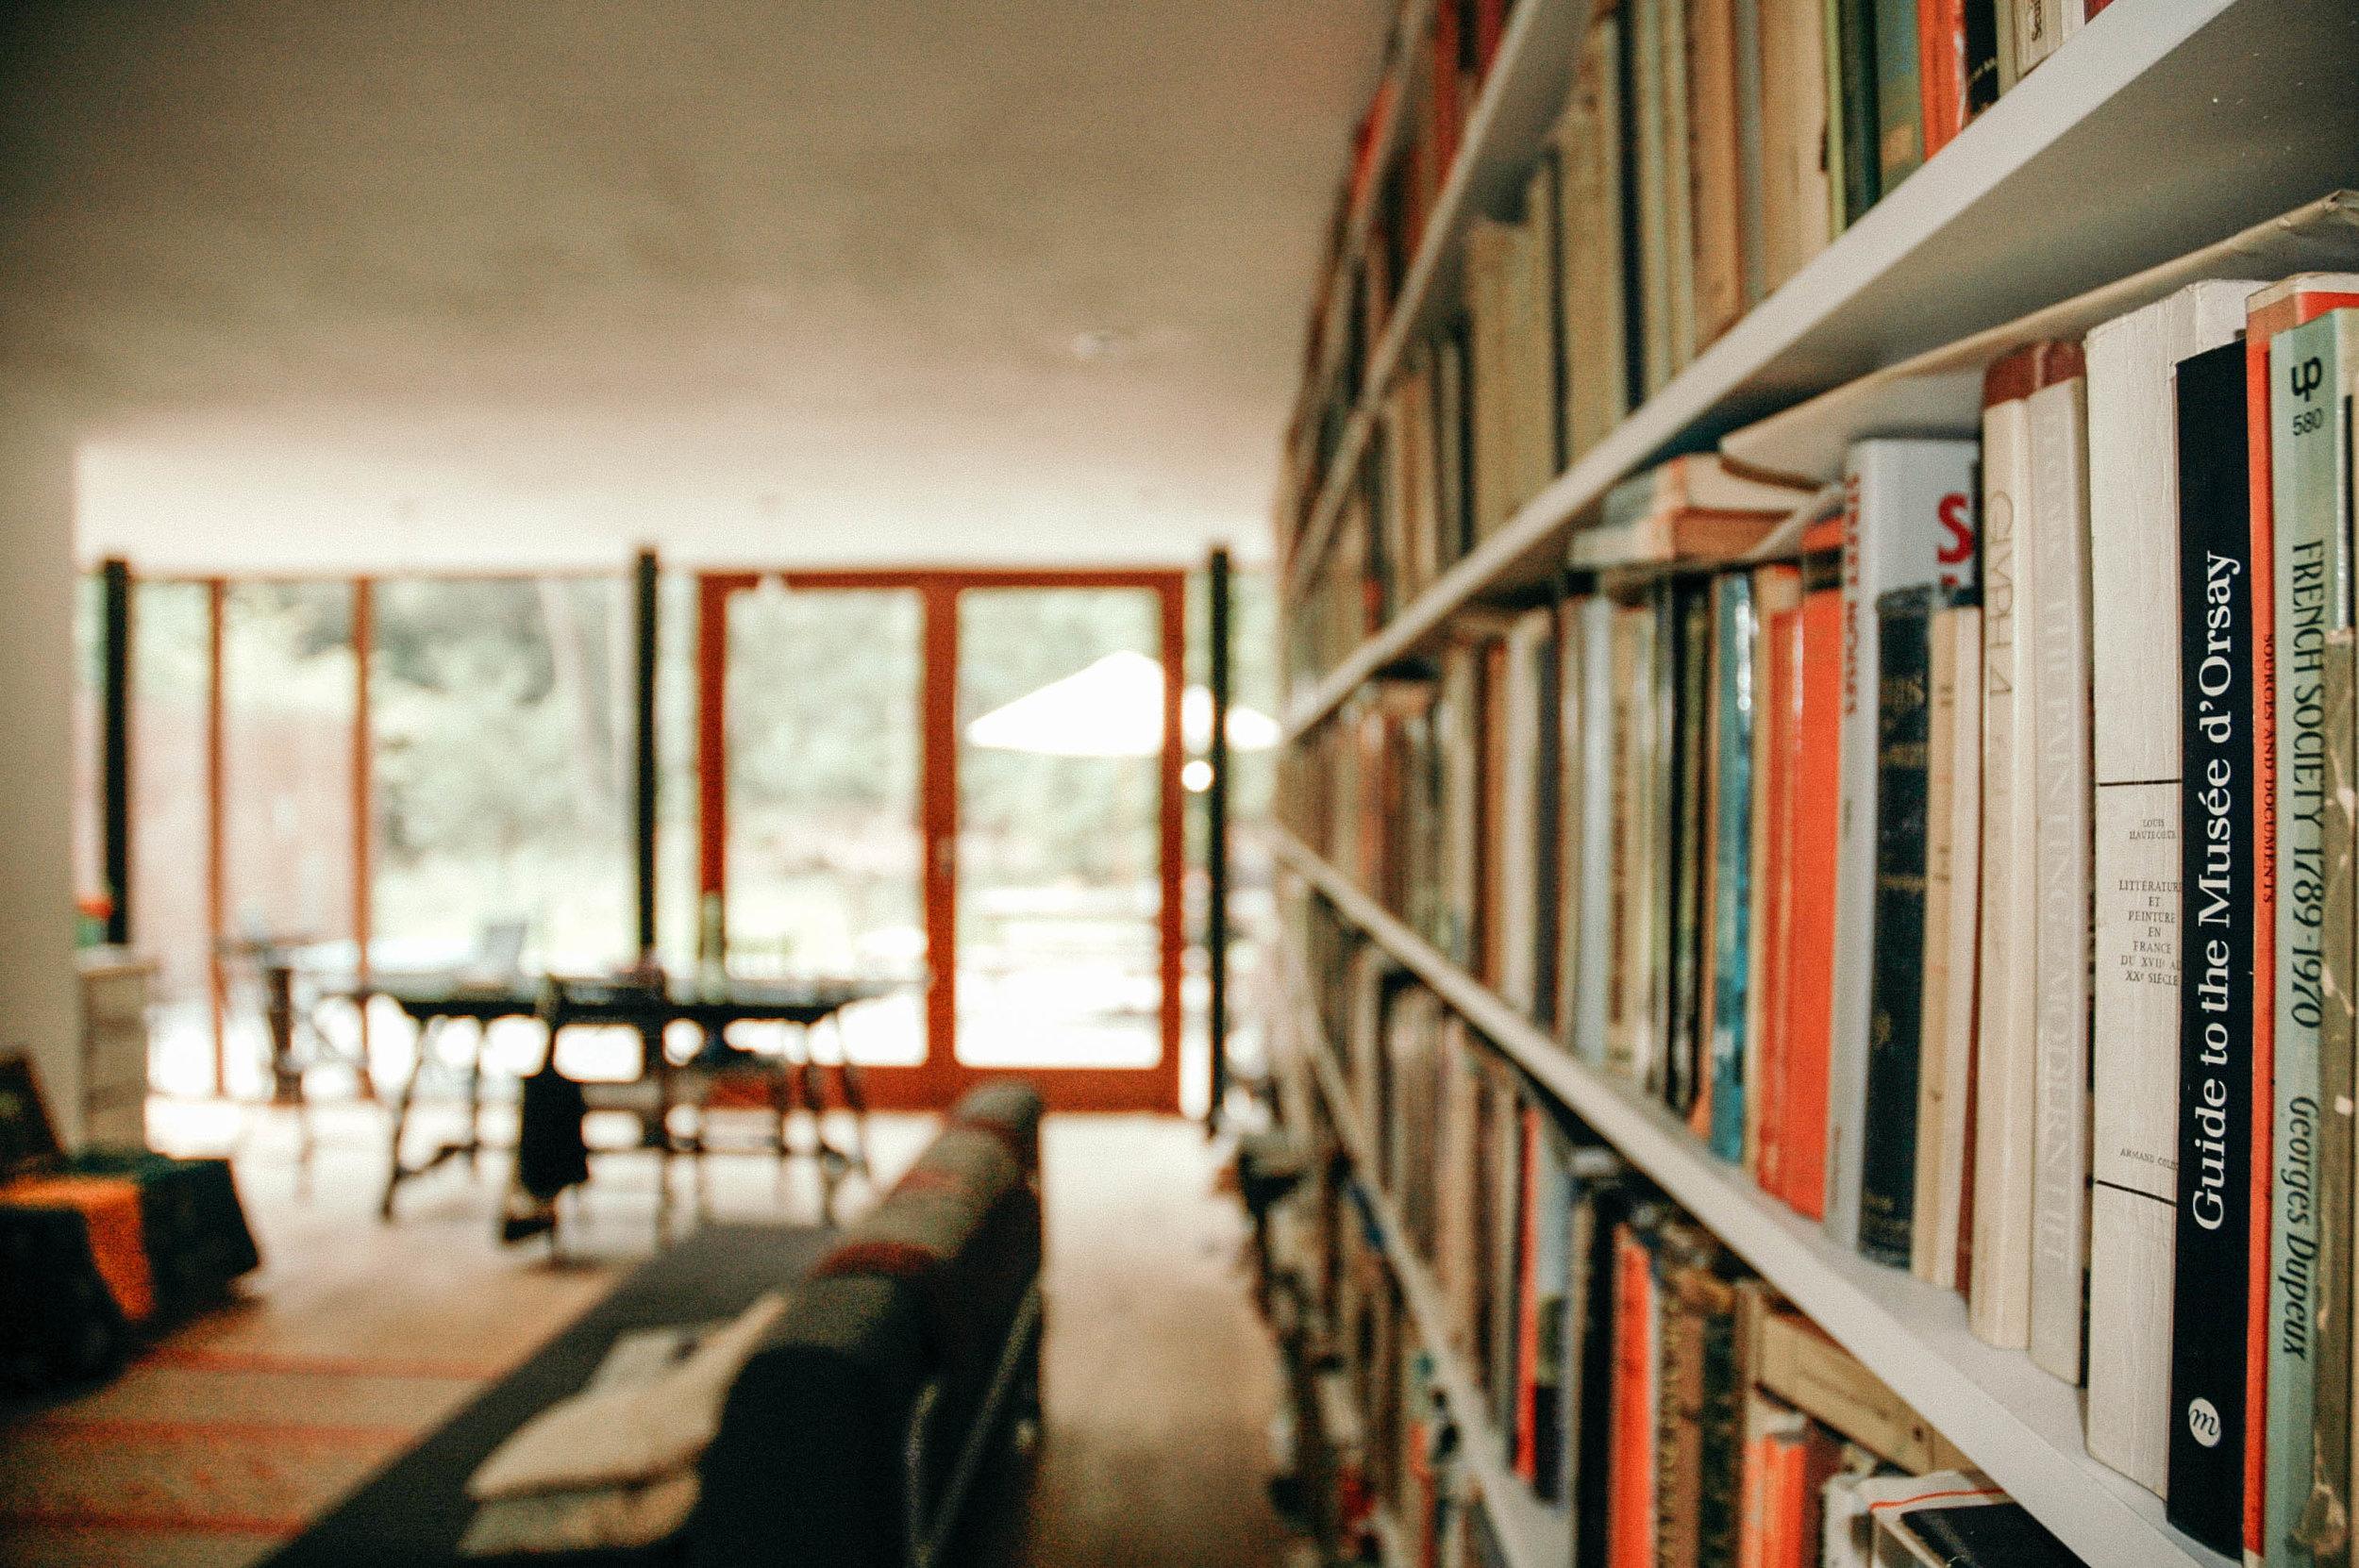 Rackham Library Books - MW Architects